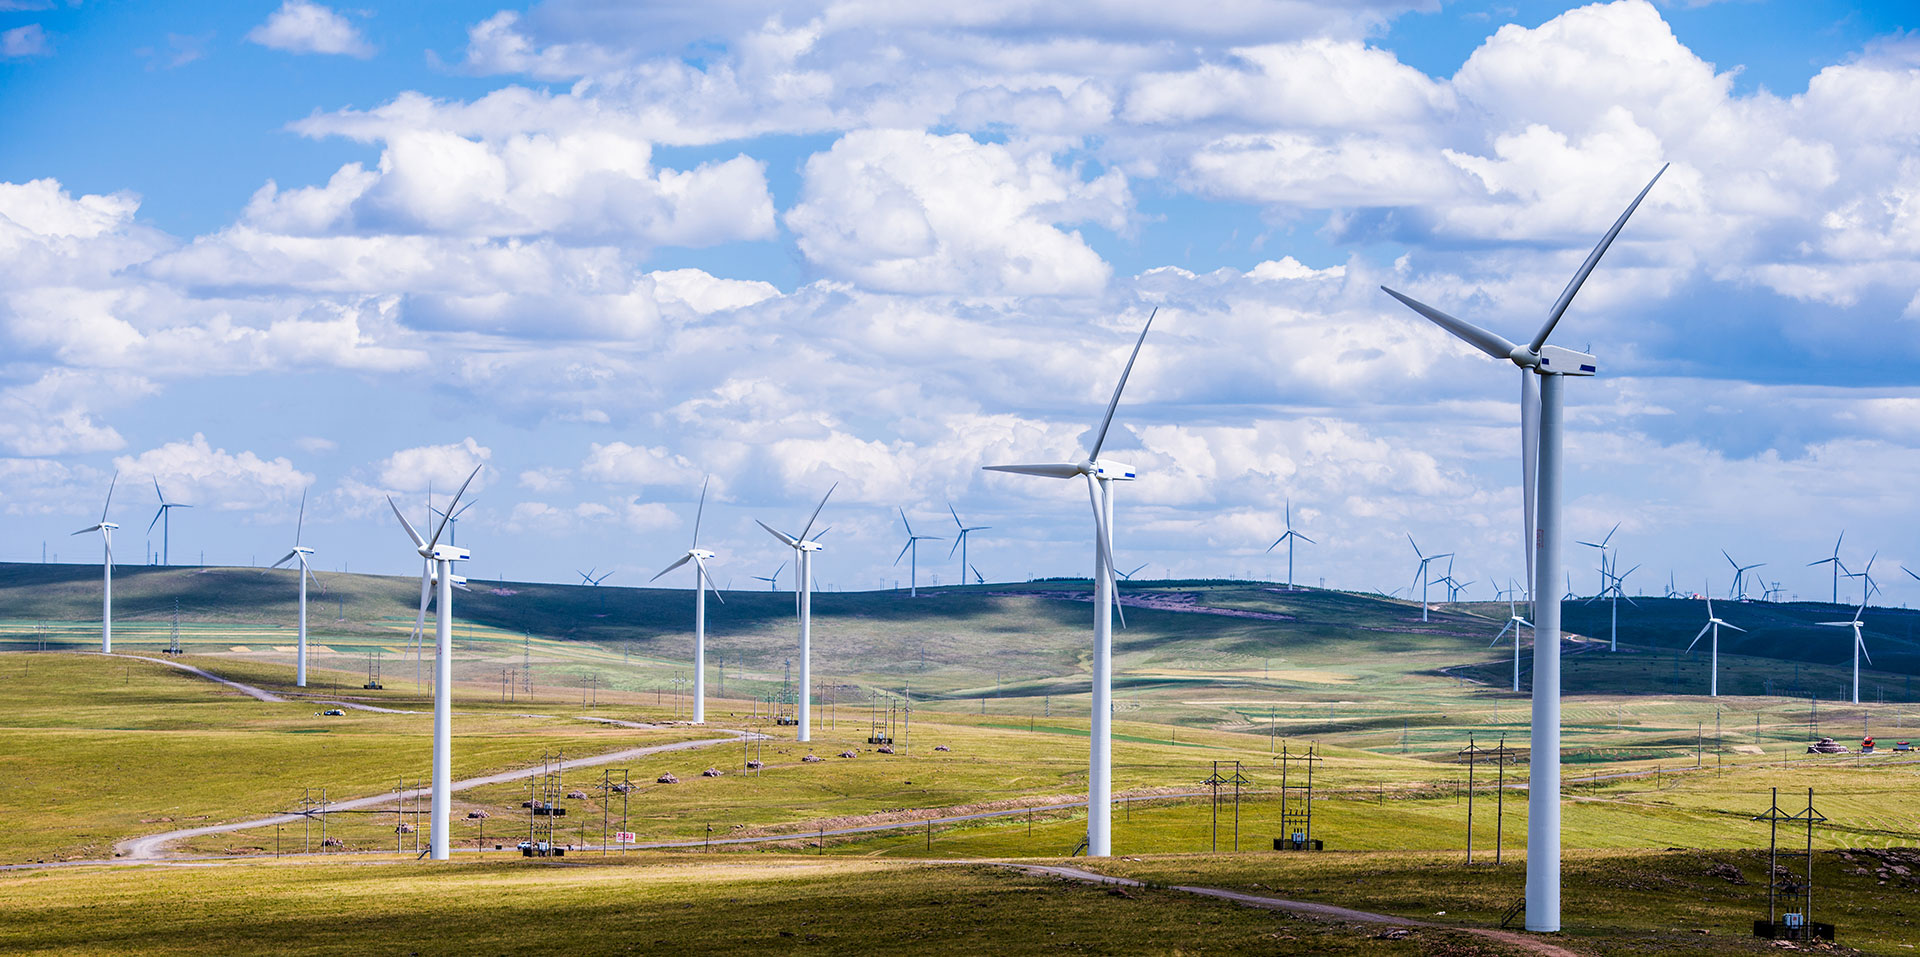 Wind Harvest International - VAWT Vertical Axis Wind Turbine